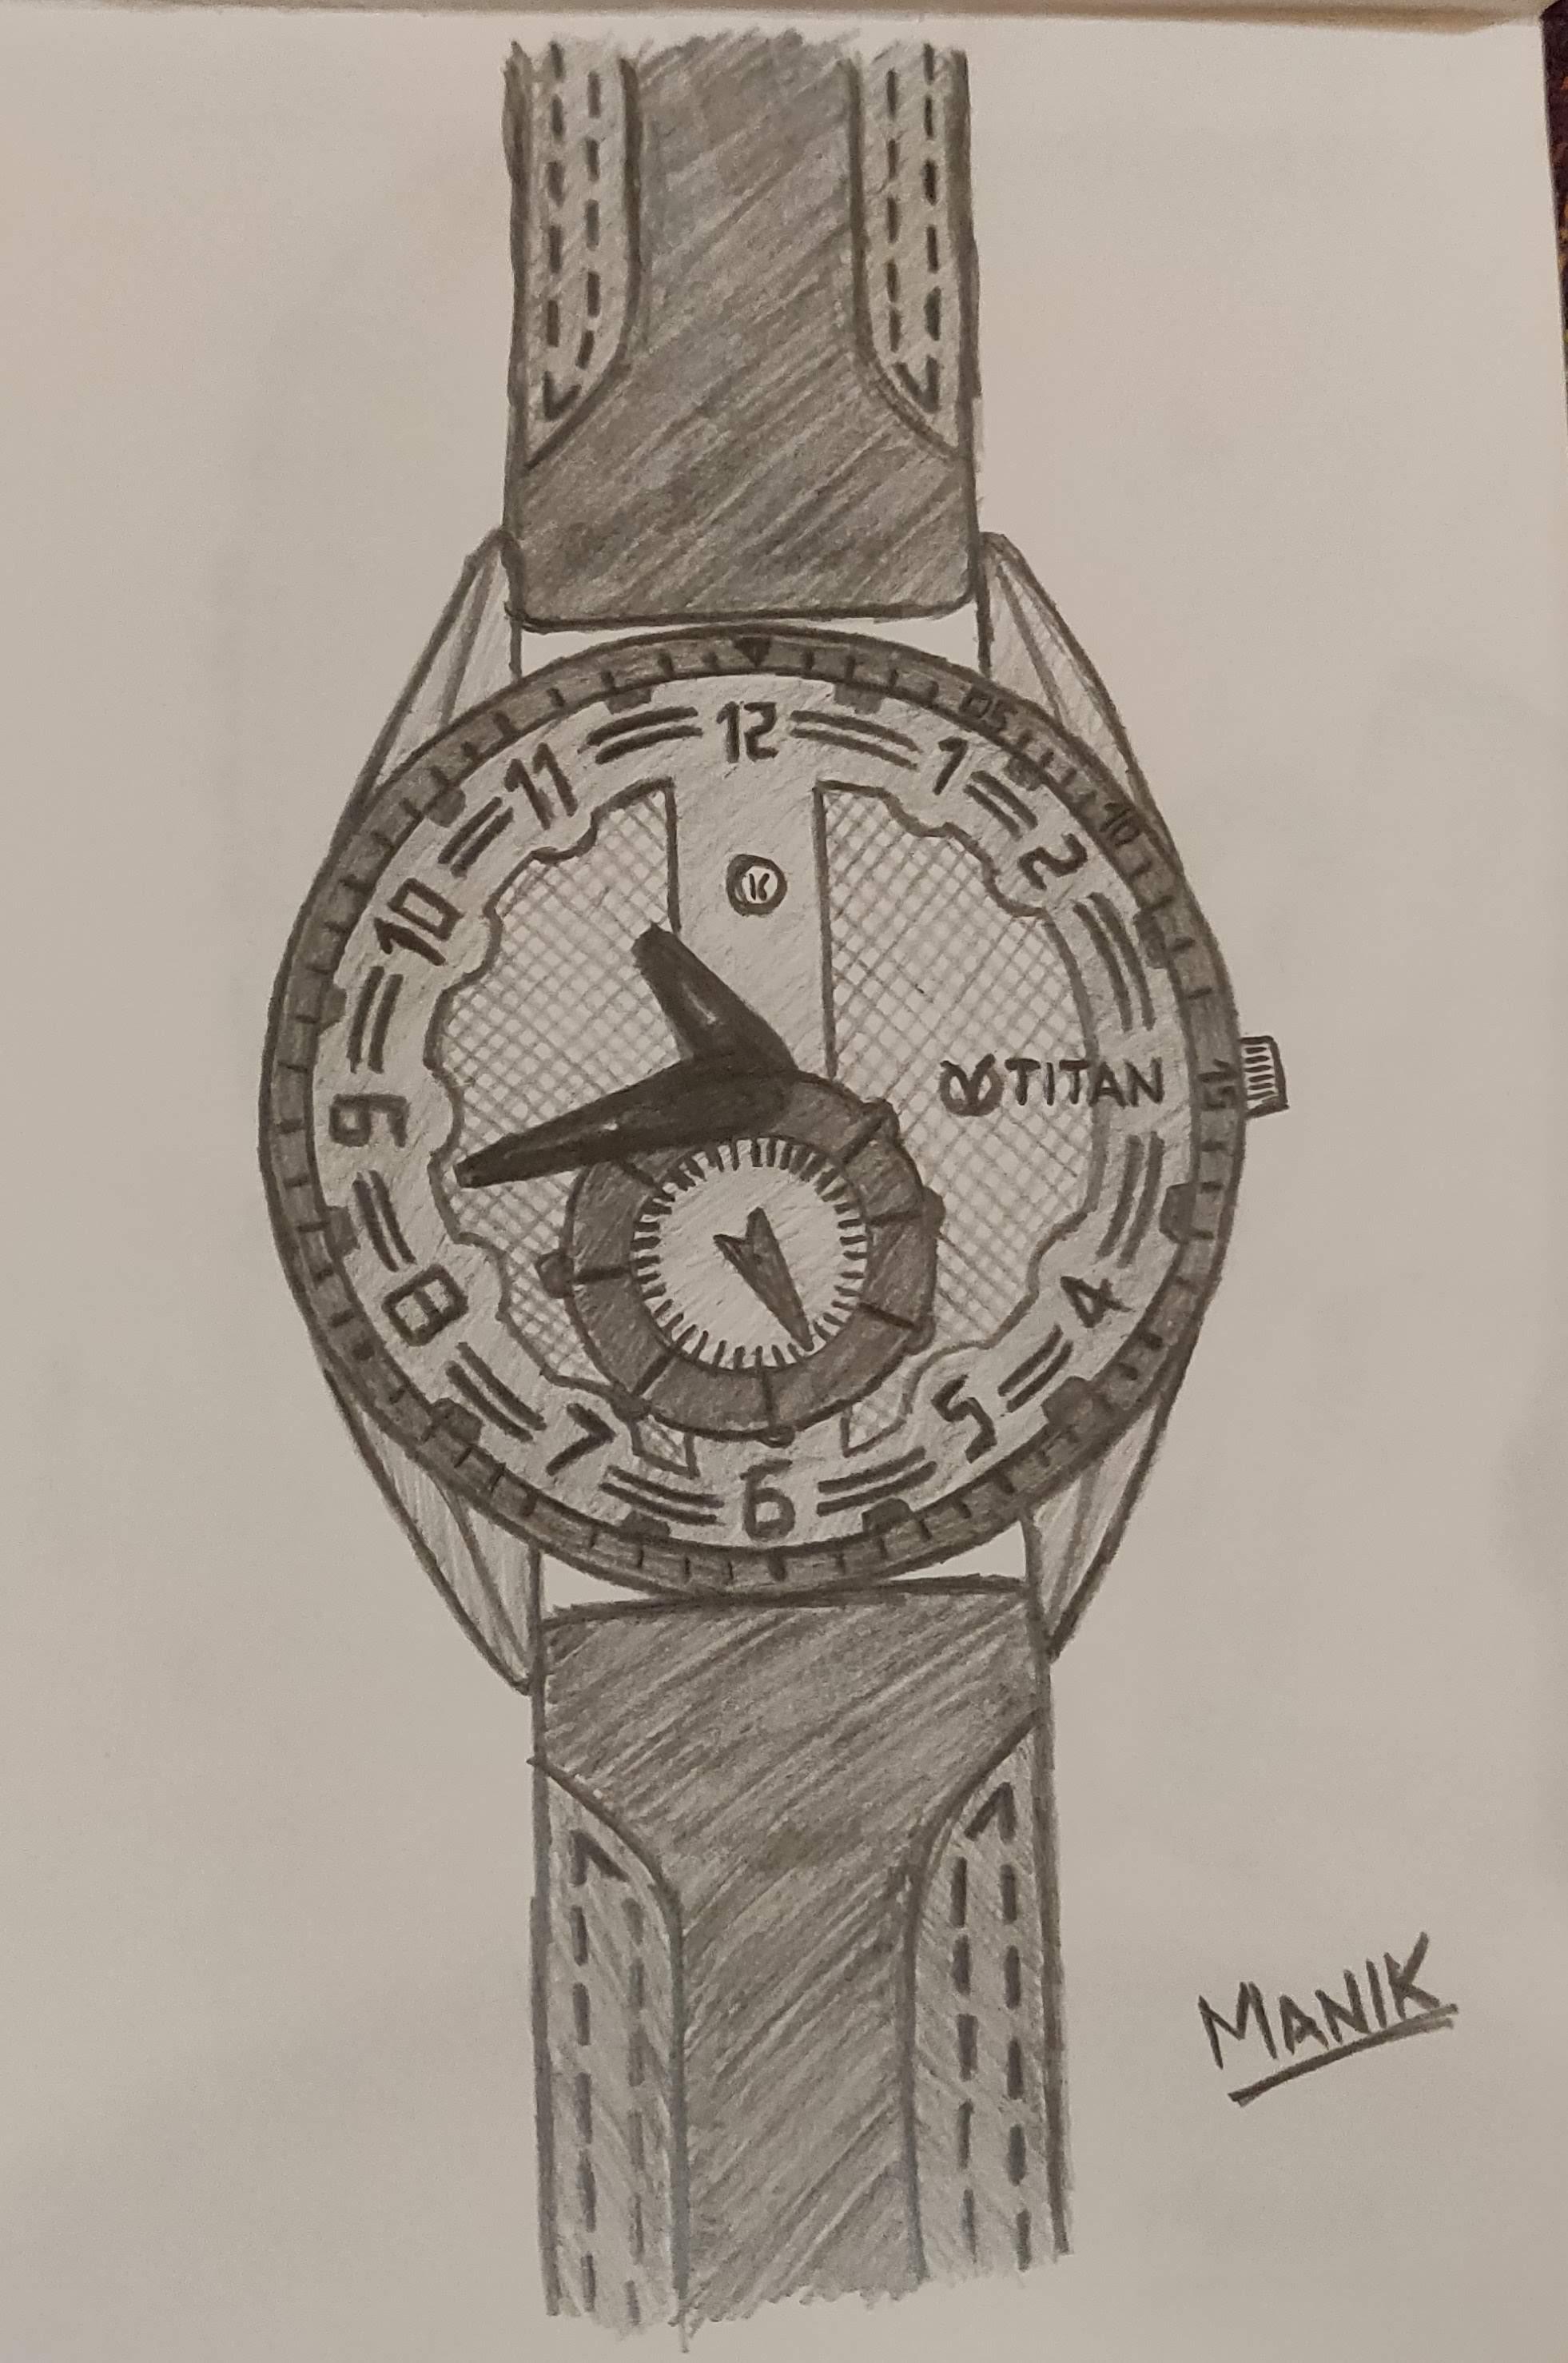 Titan wrist watch pencil sketch